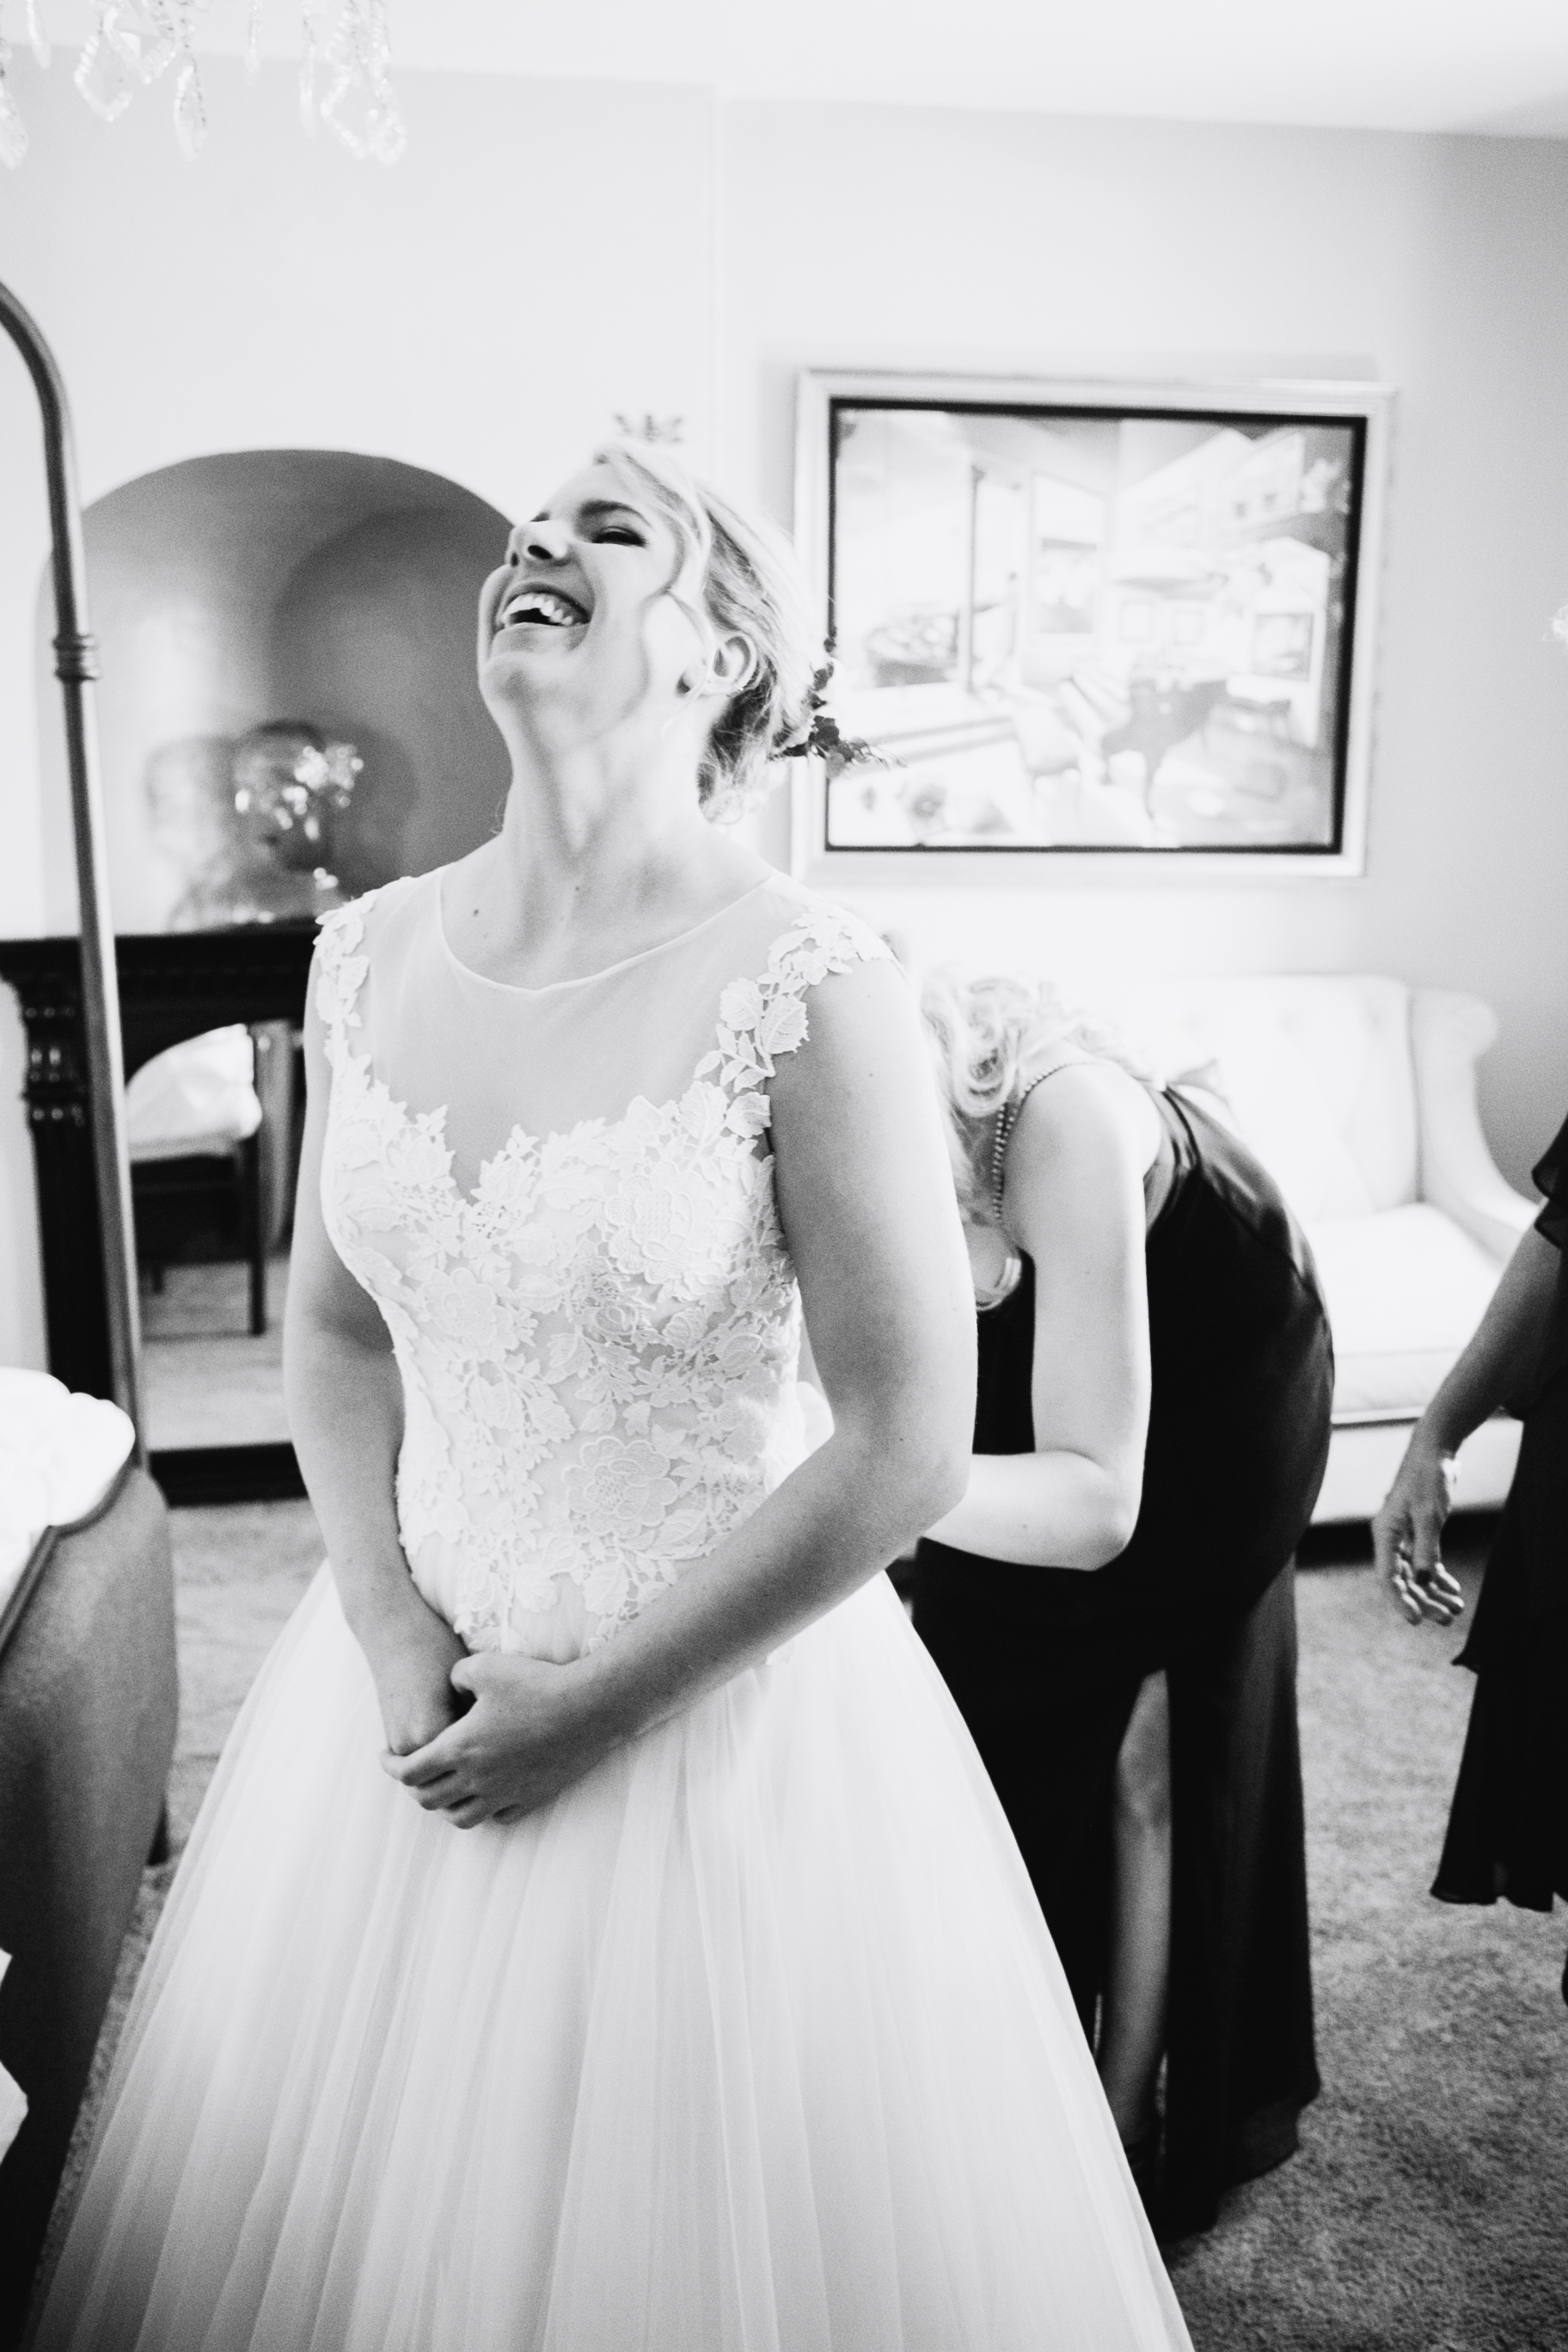 LA LUNA BANQUET HALL WEDDING BENSALEM - 017.jpg